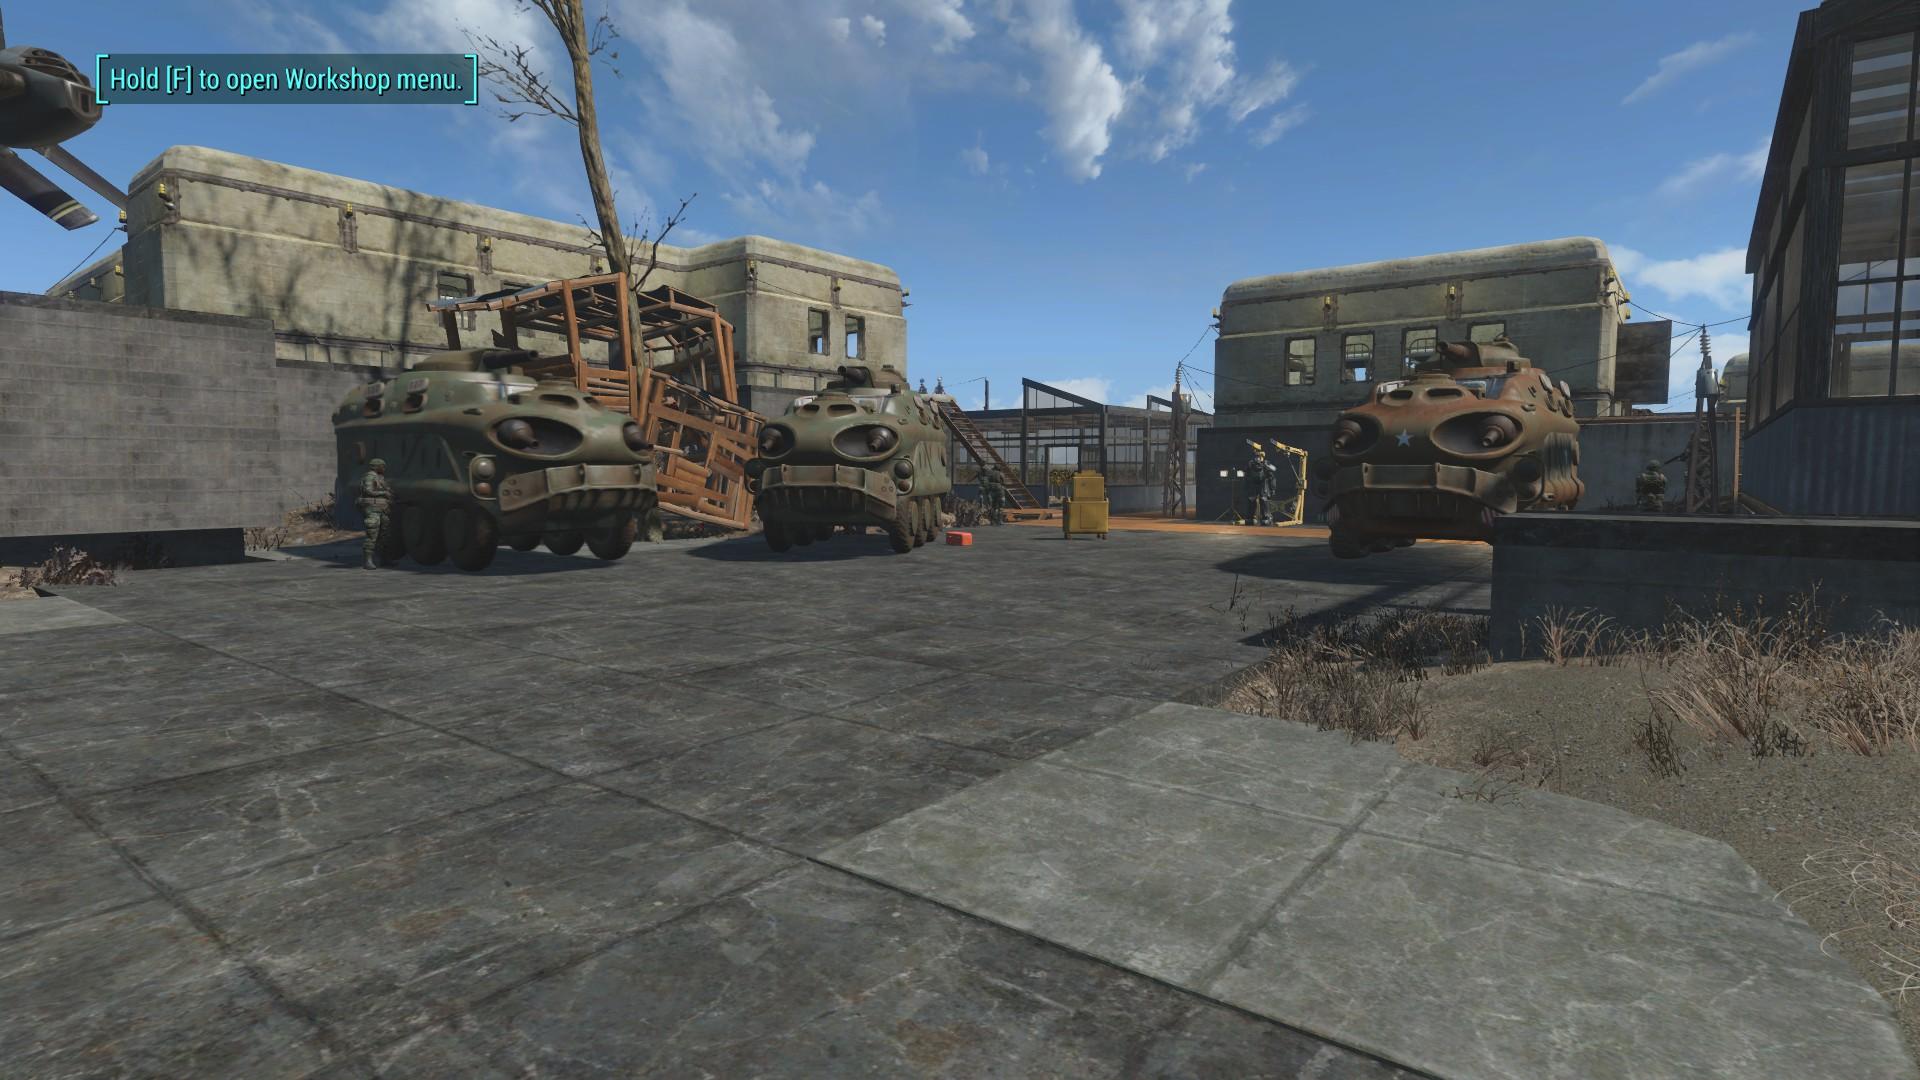 Show your Fallout 4 Settlements! 6858747A48885D0B177AC16DEBA87771B378FC57